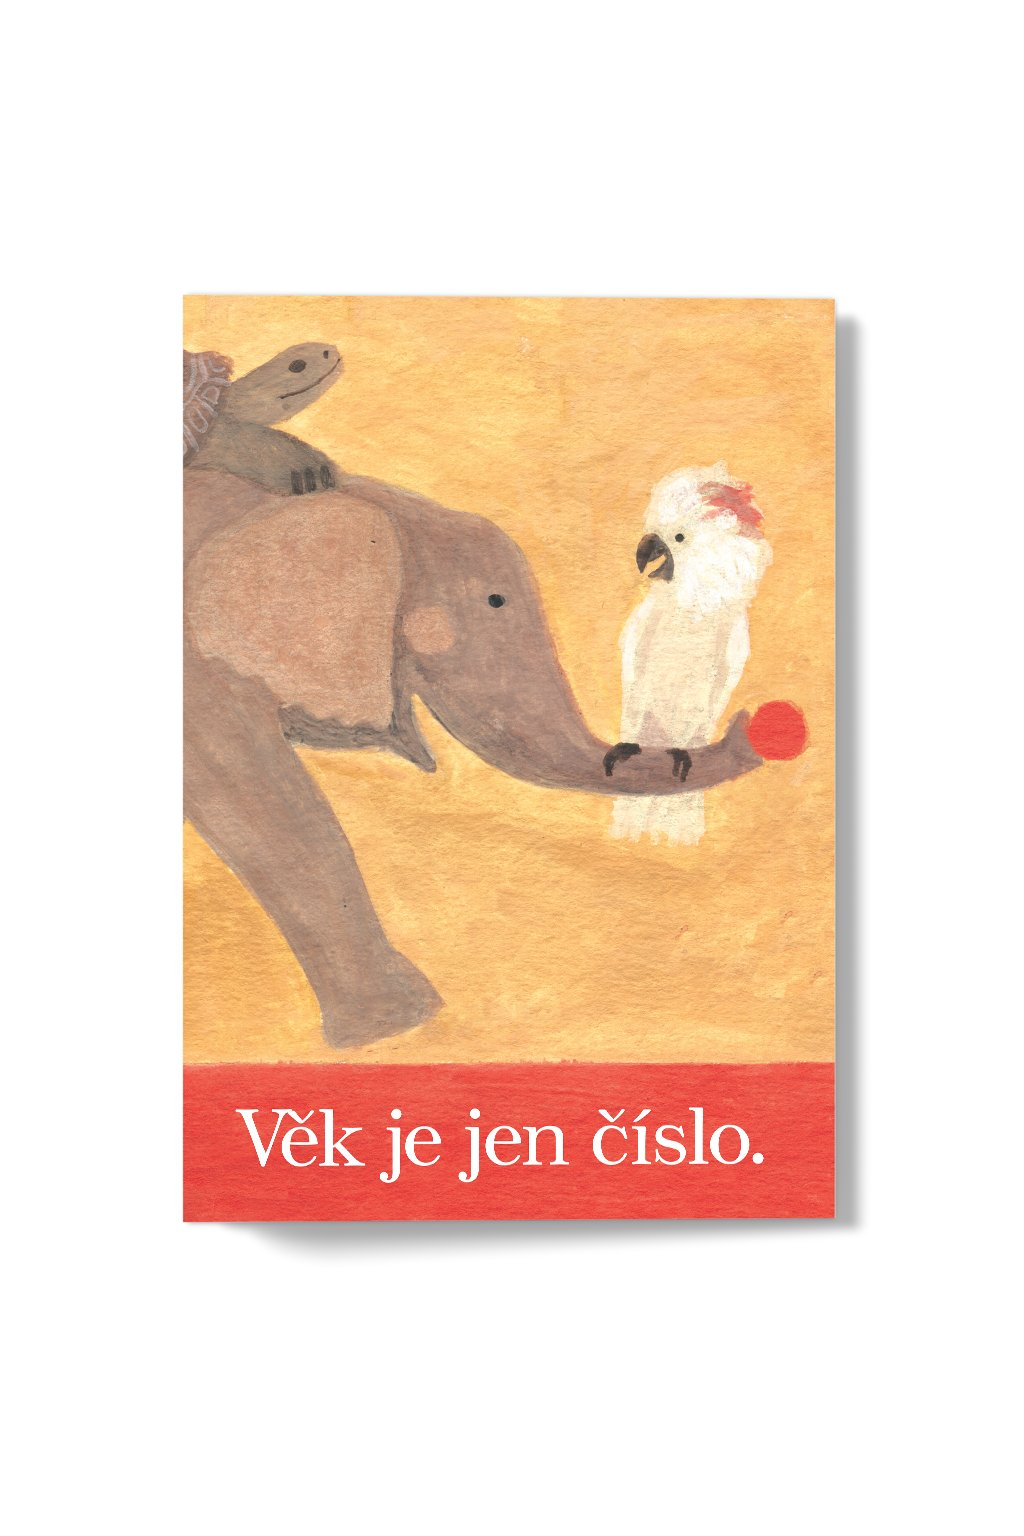 JAATY_narozeninove-pranicko_vek-je-jen-cislo-slon